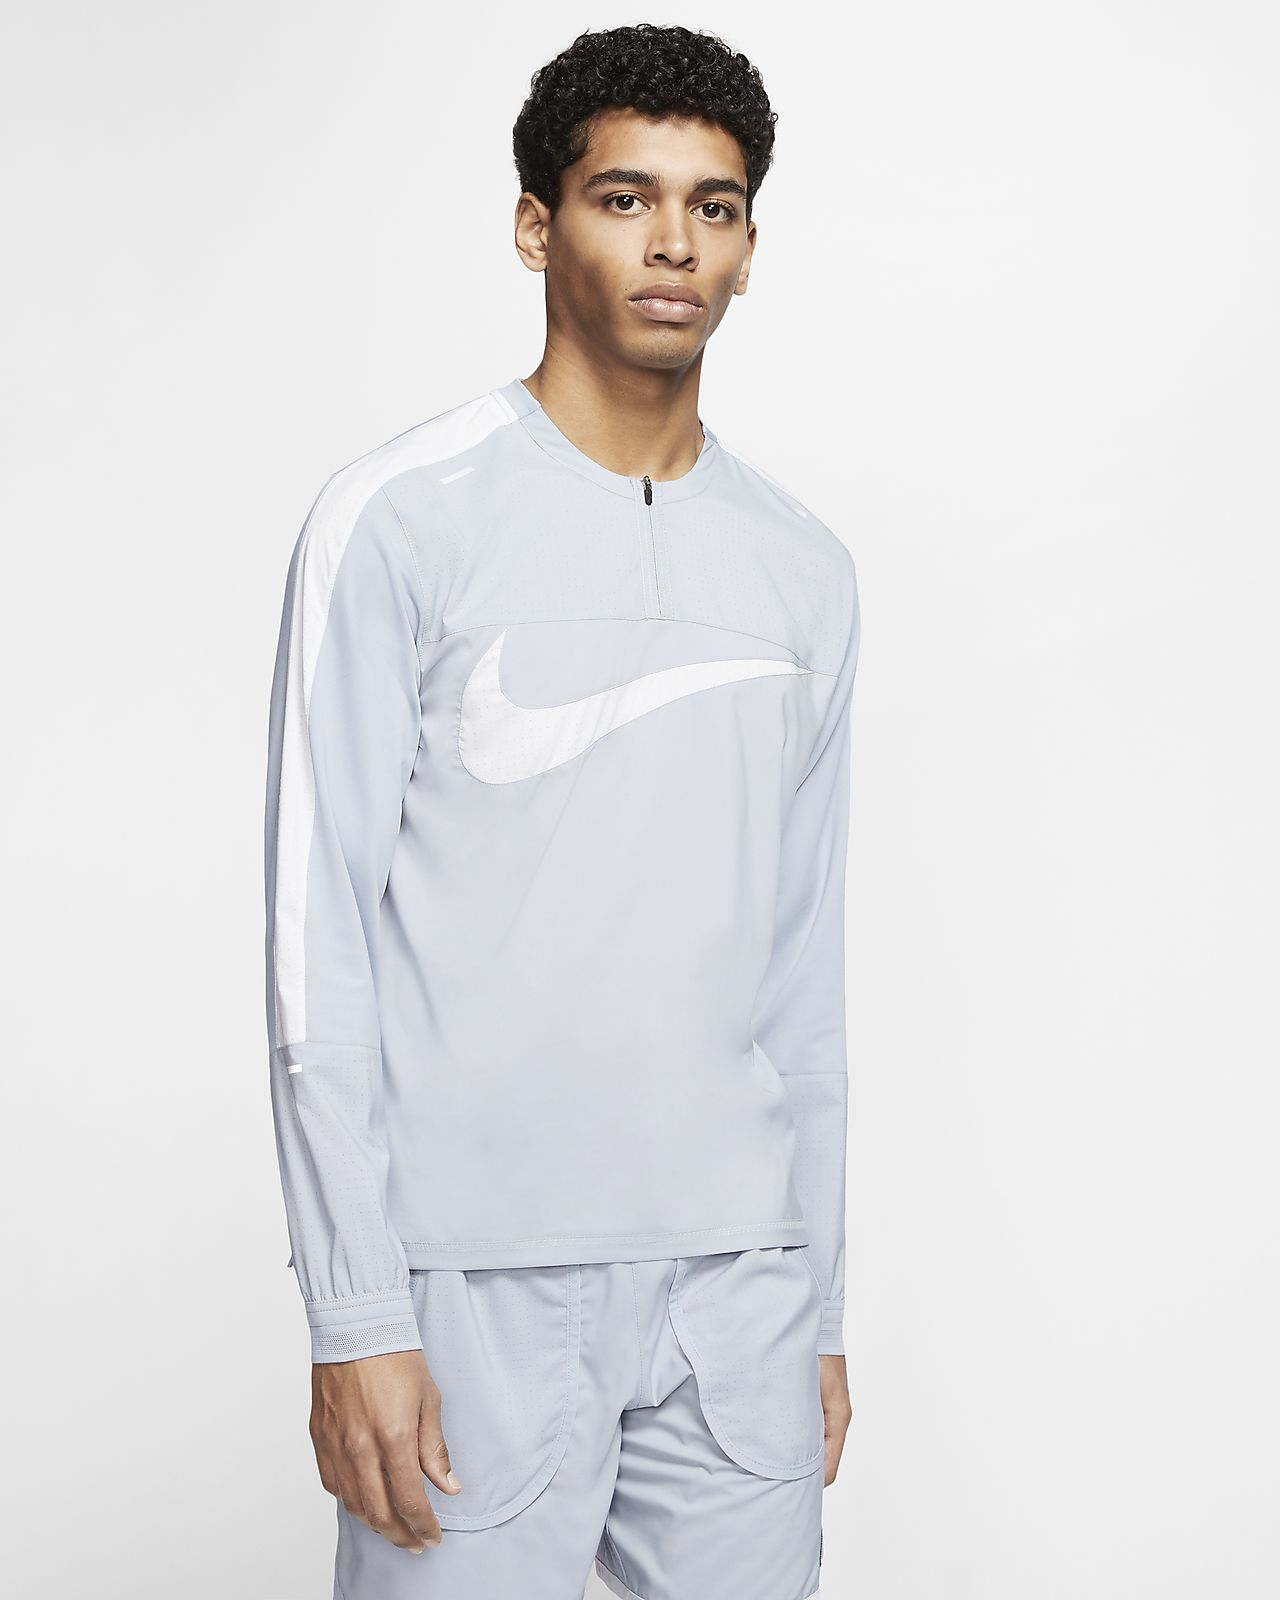 Мужская беговая футболка с молнией 1/4 Nike